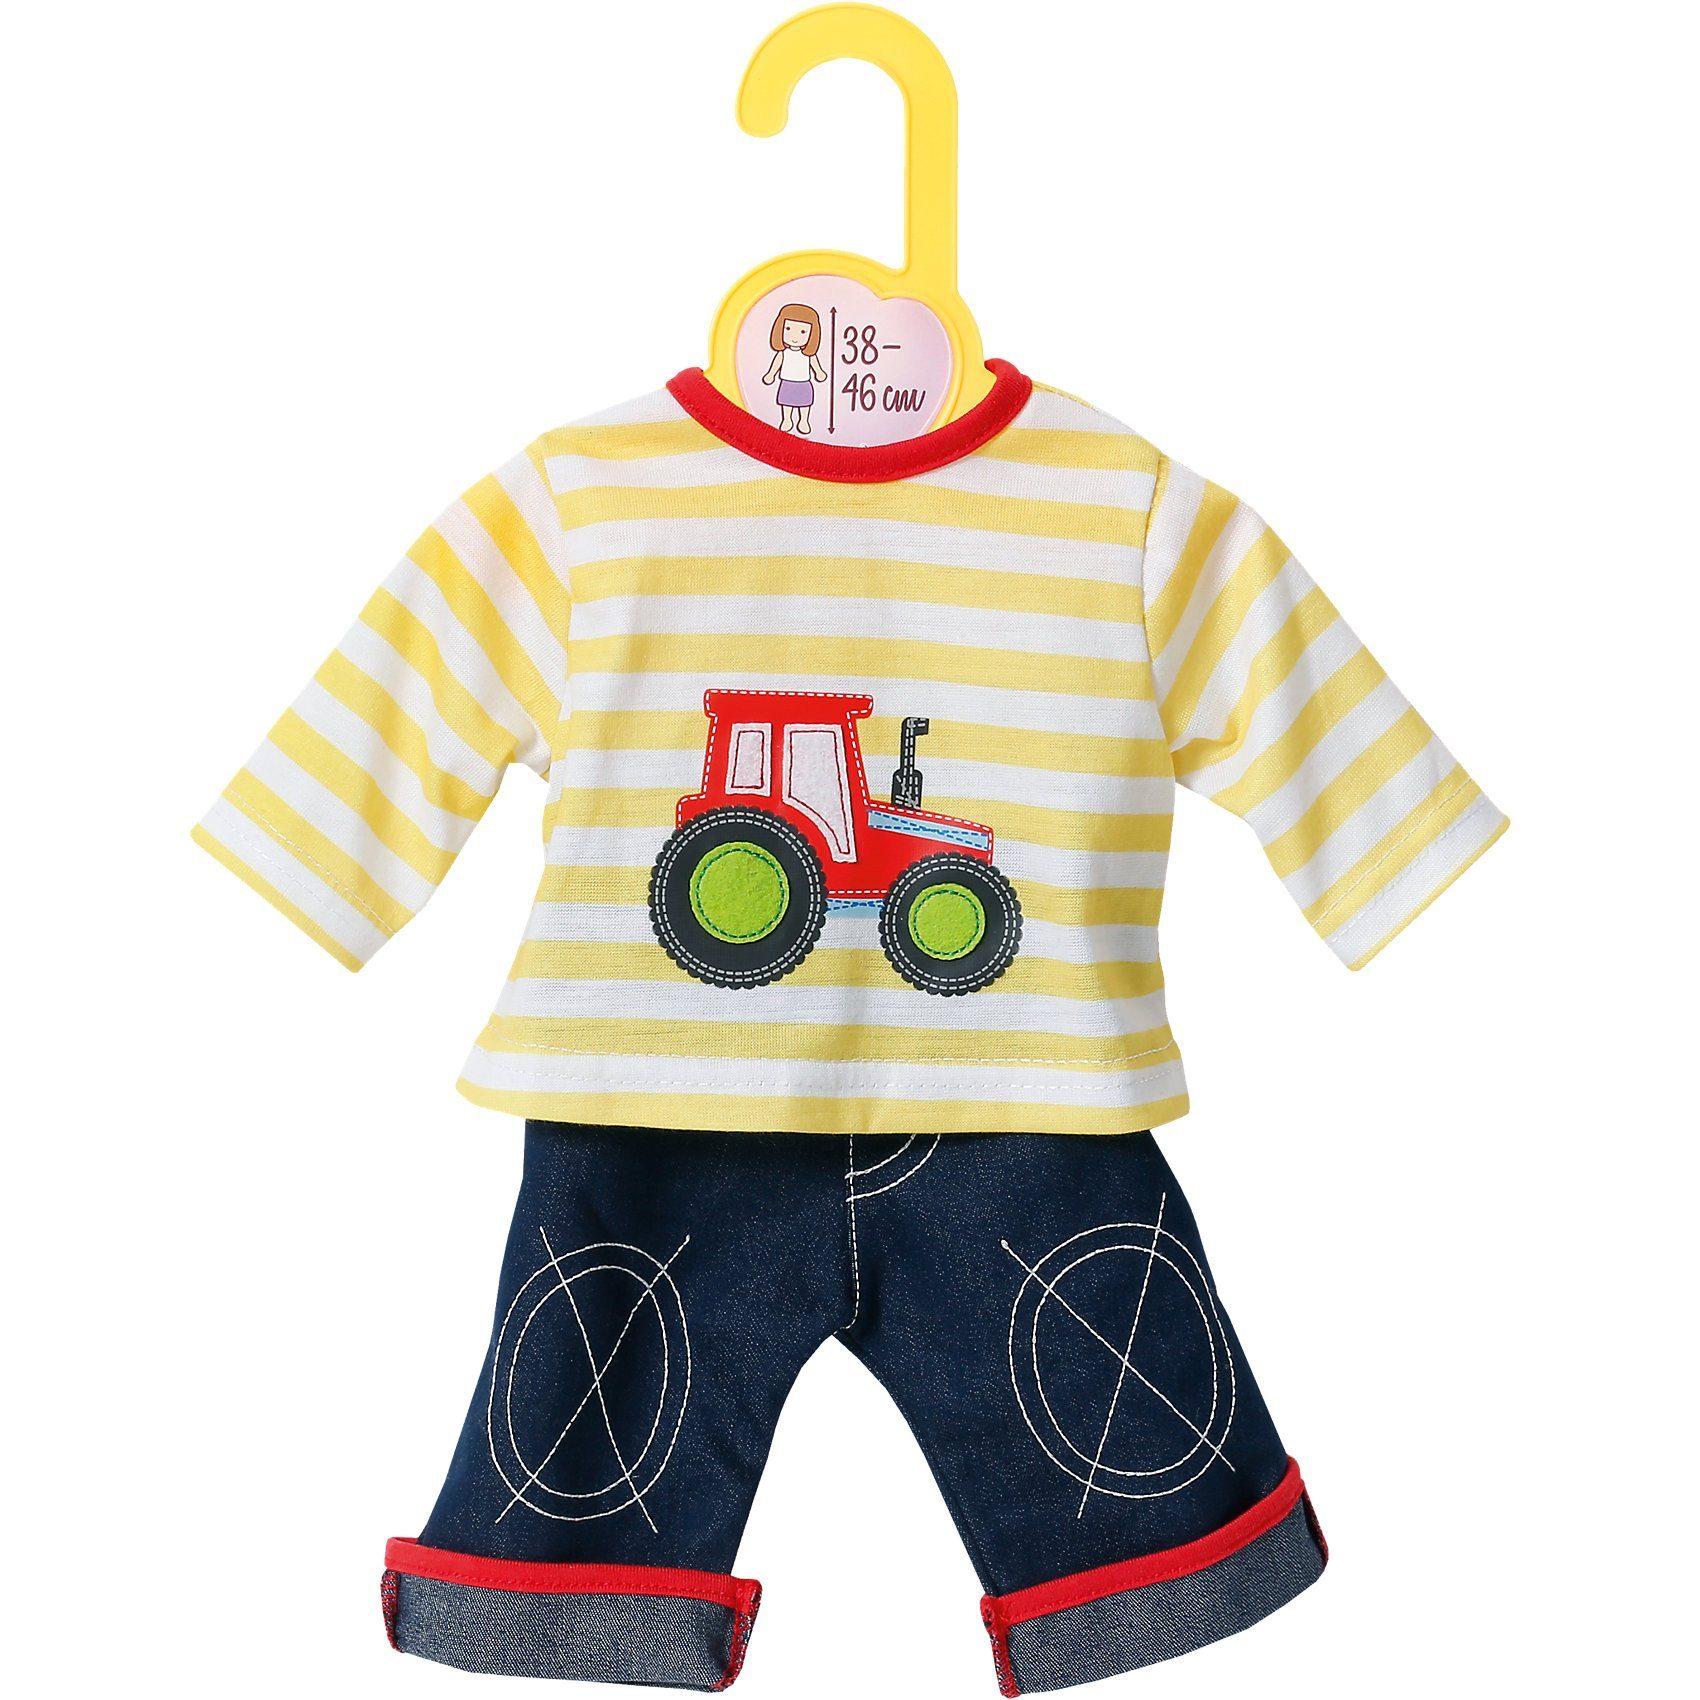 Zapf Creation Dolly Moda Puppenkleidung Jeans mit Shirt 38-46 cm